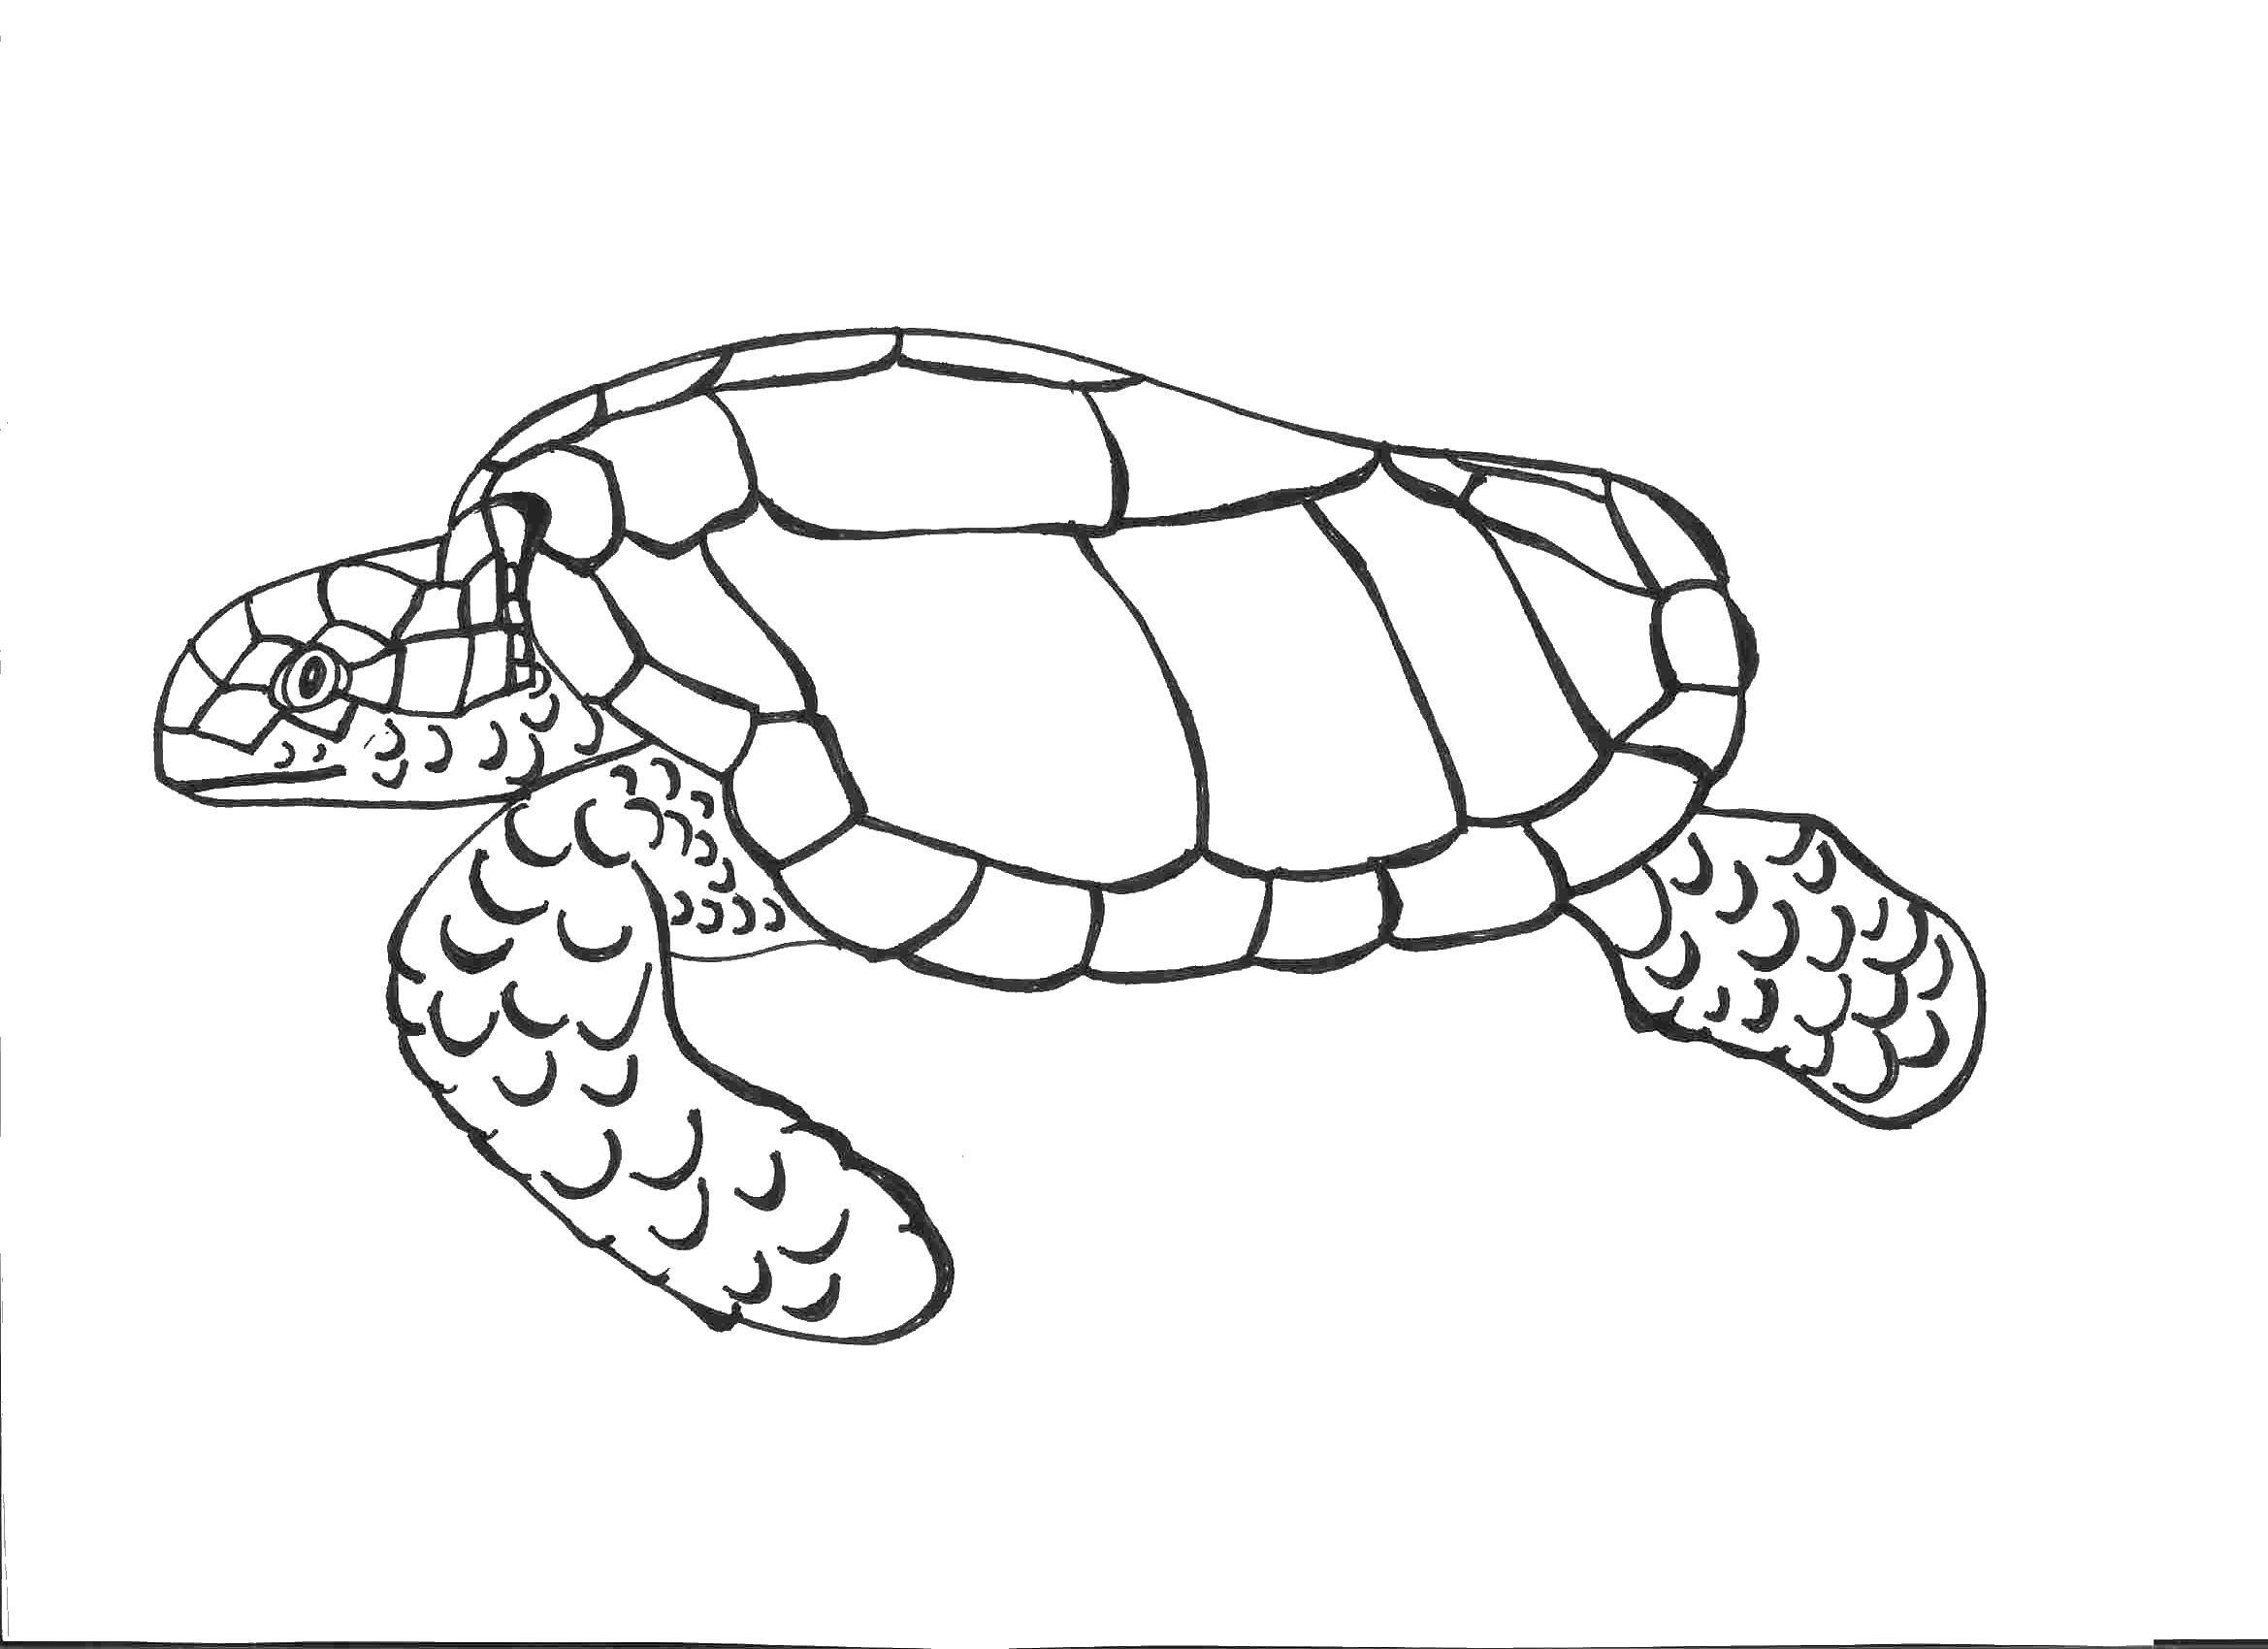 Раскраска Старая морская черепаха. Скачать Рептилия, черепаха.  Распечатать ,Морская черепаха,